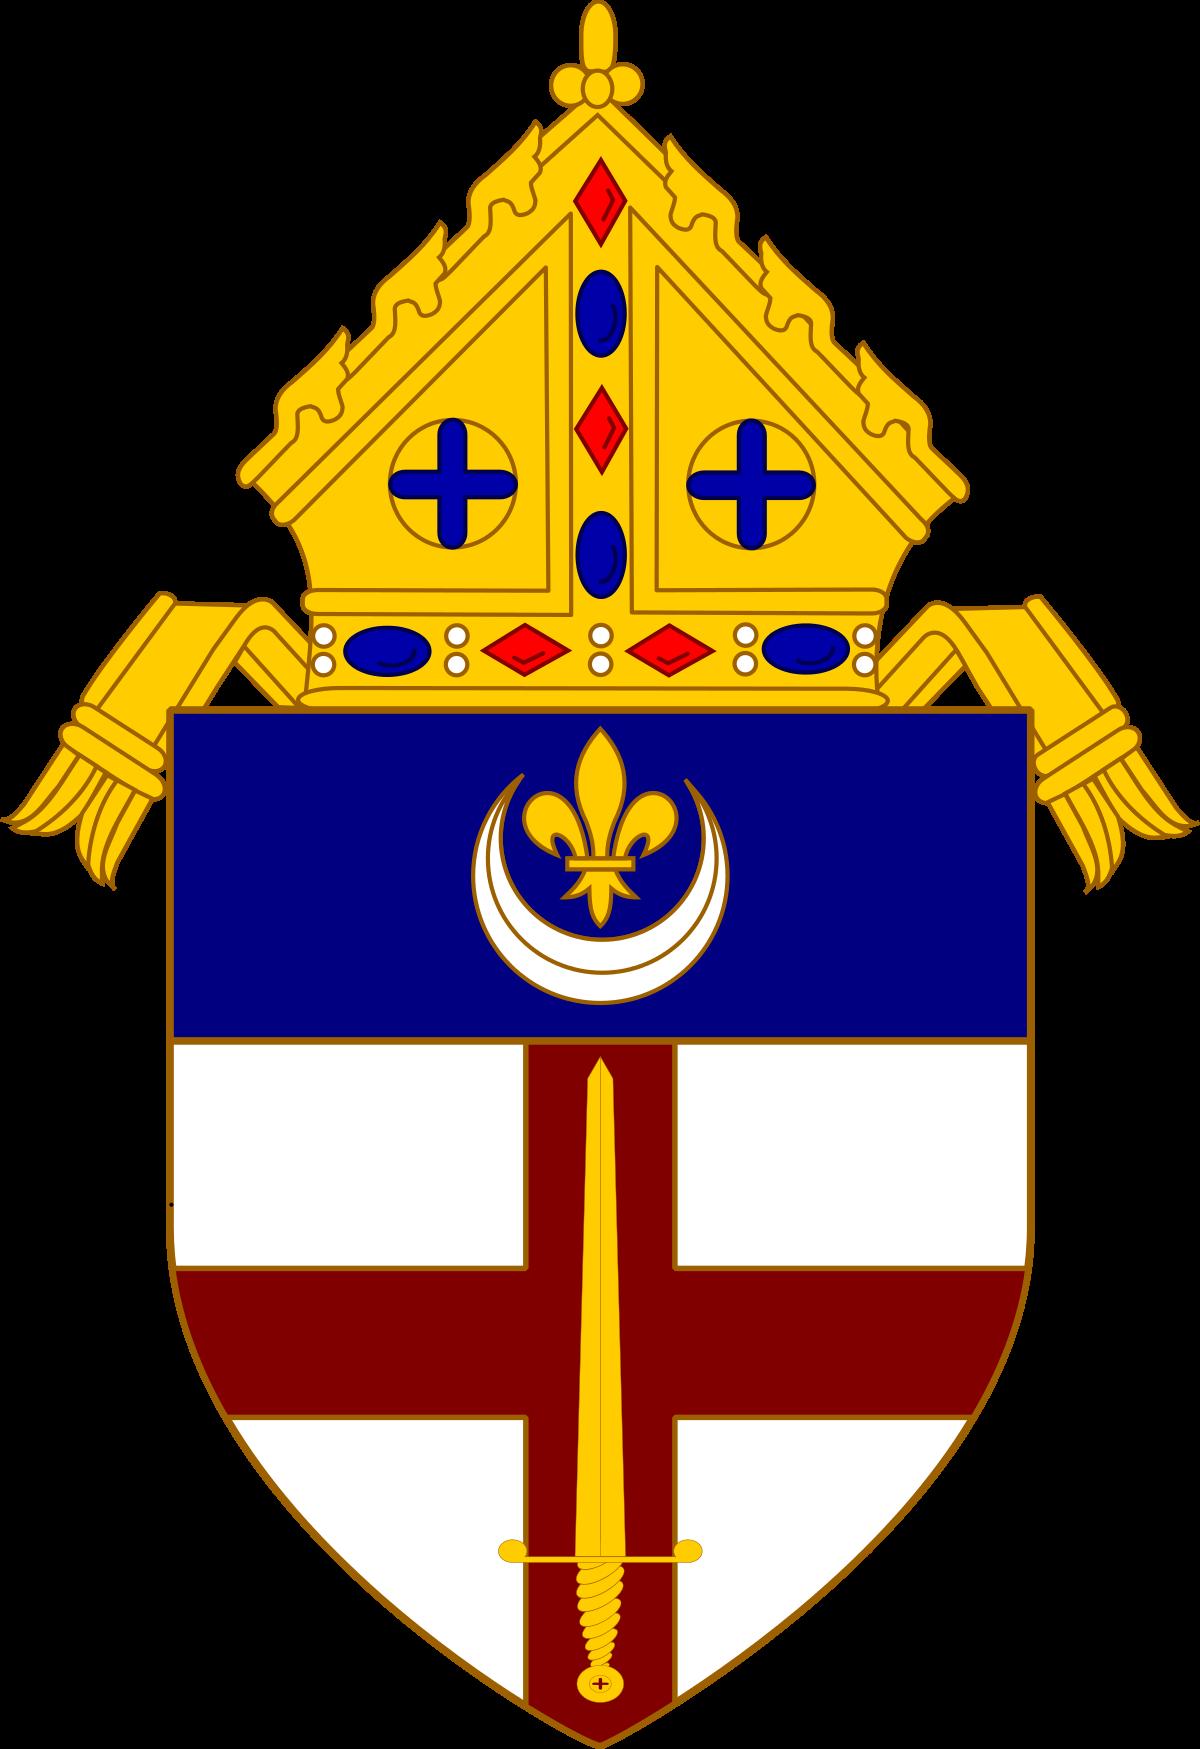 Religion This Is A Symbol Of The Roman Catholic Religion In Austria The Interest In Catholic